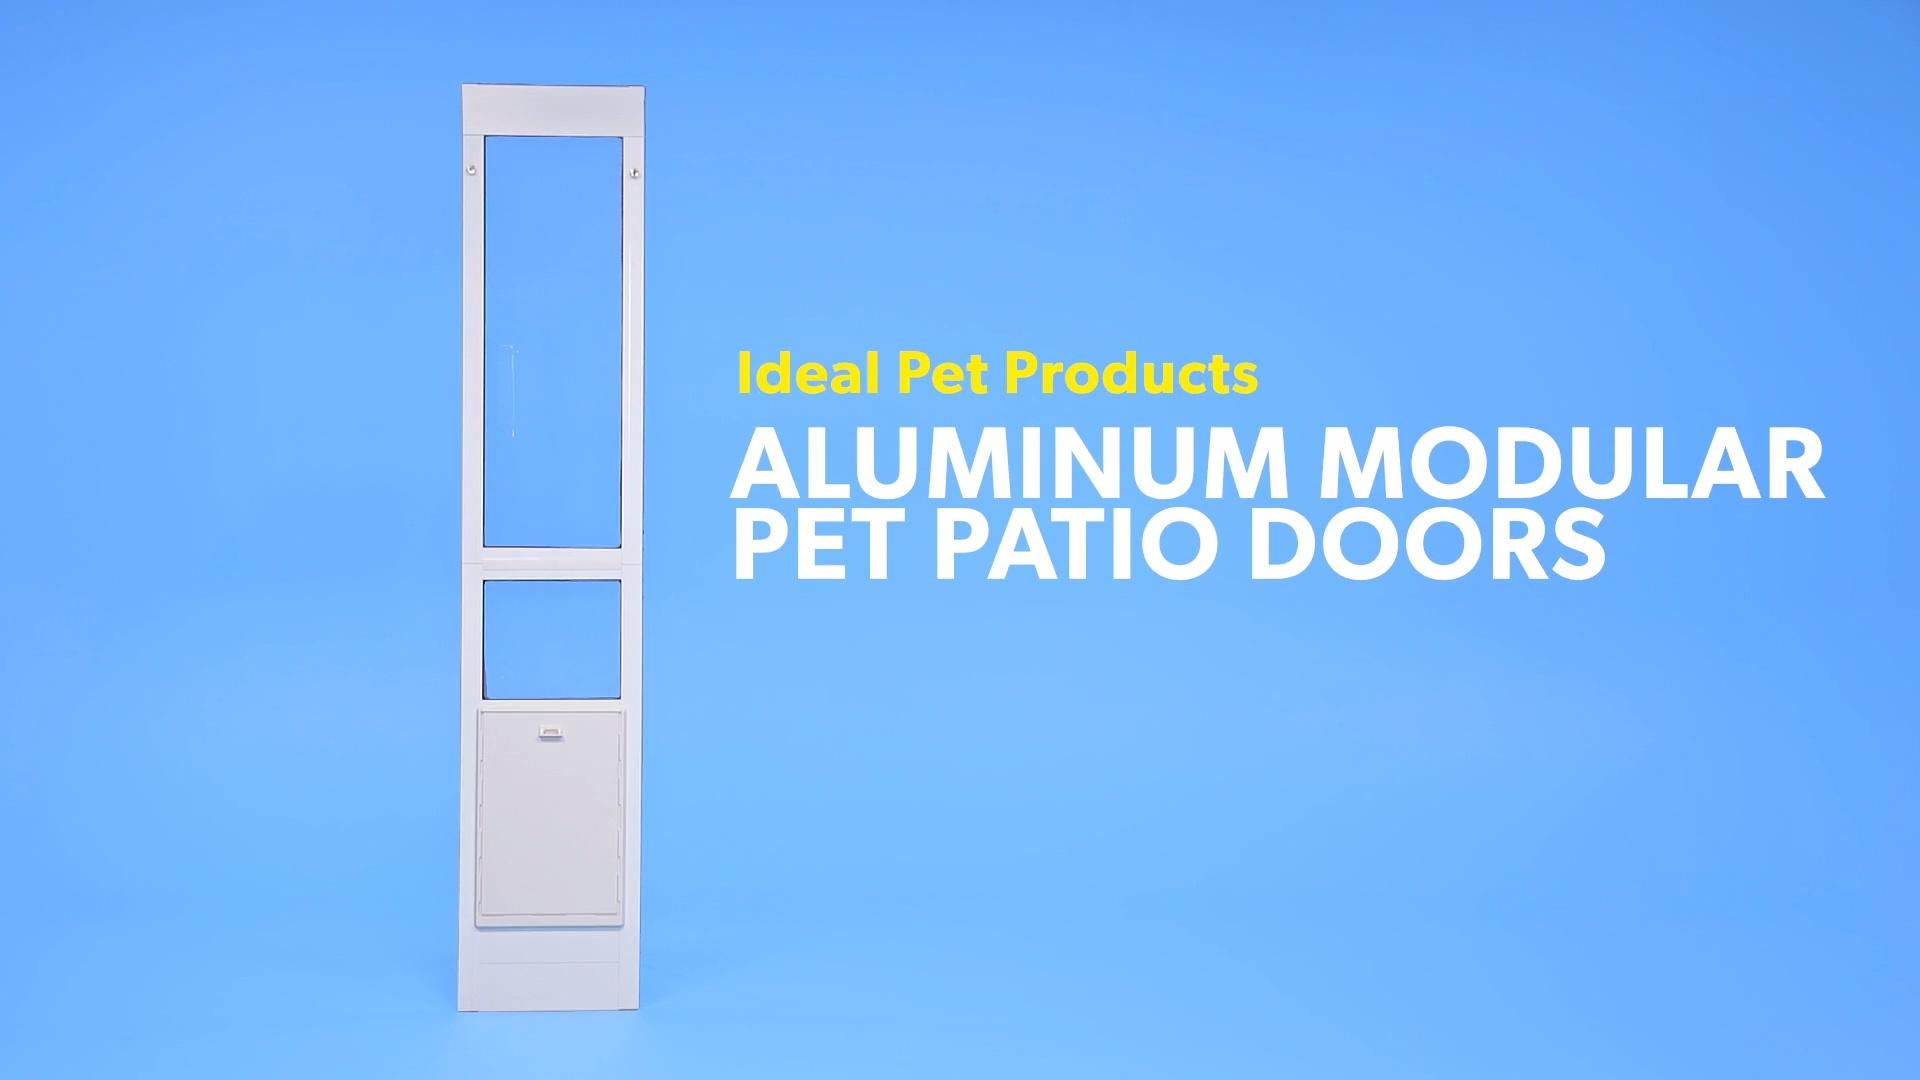 Ideal Pet Products Aluminum Modular Pet Patio Door adjustable height 77-5//8-80 3//8